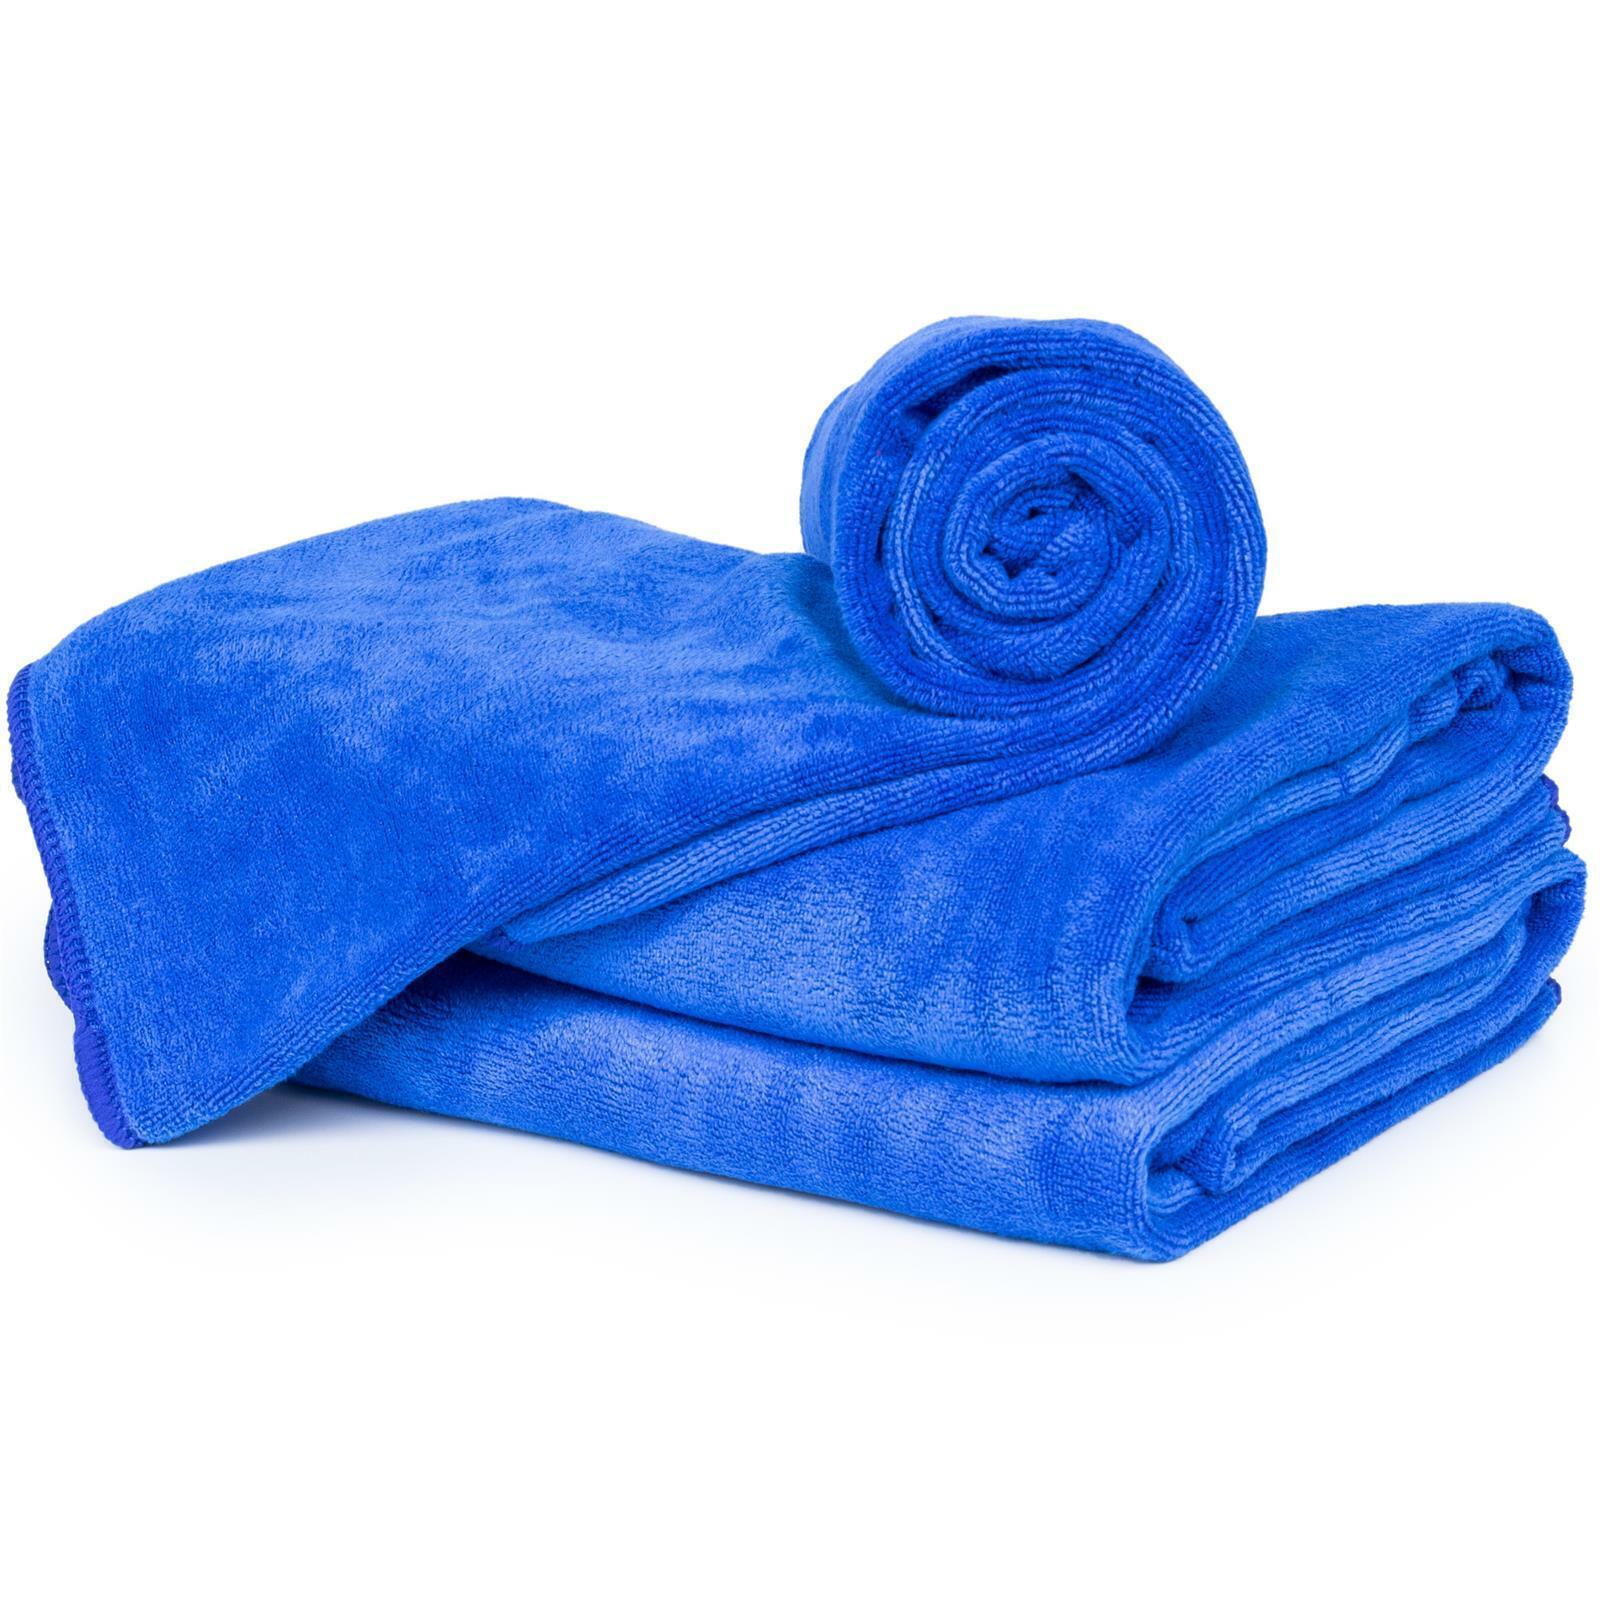 3 Piece Microfibre Towel, Navy – Shower Towel Bath Towel Sauna Towel – 40x60cm